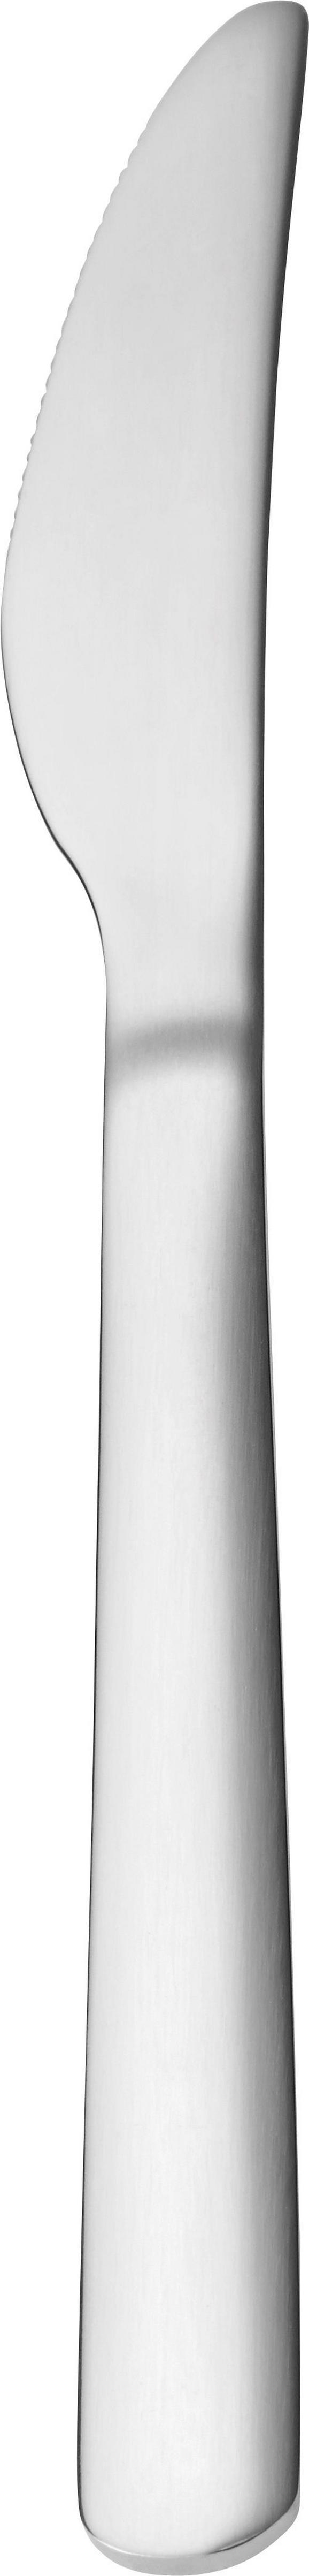 Messer Demi in Edelstahl - Edelstahlfarben, KONVENTIONELL, Metall (21cm) - Mömax modern living